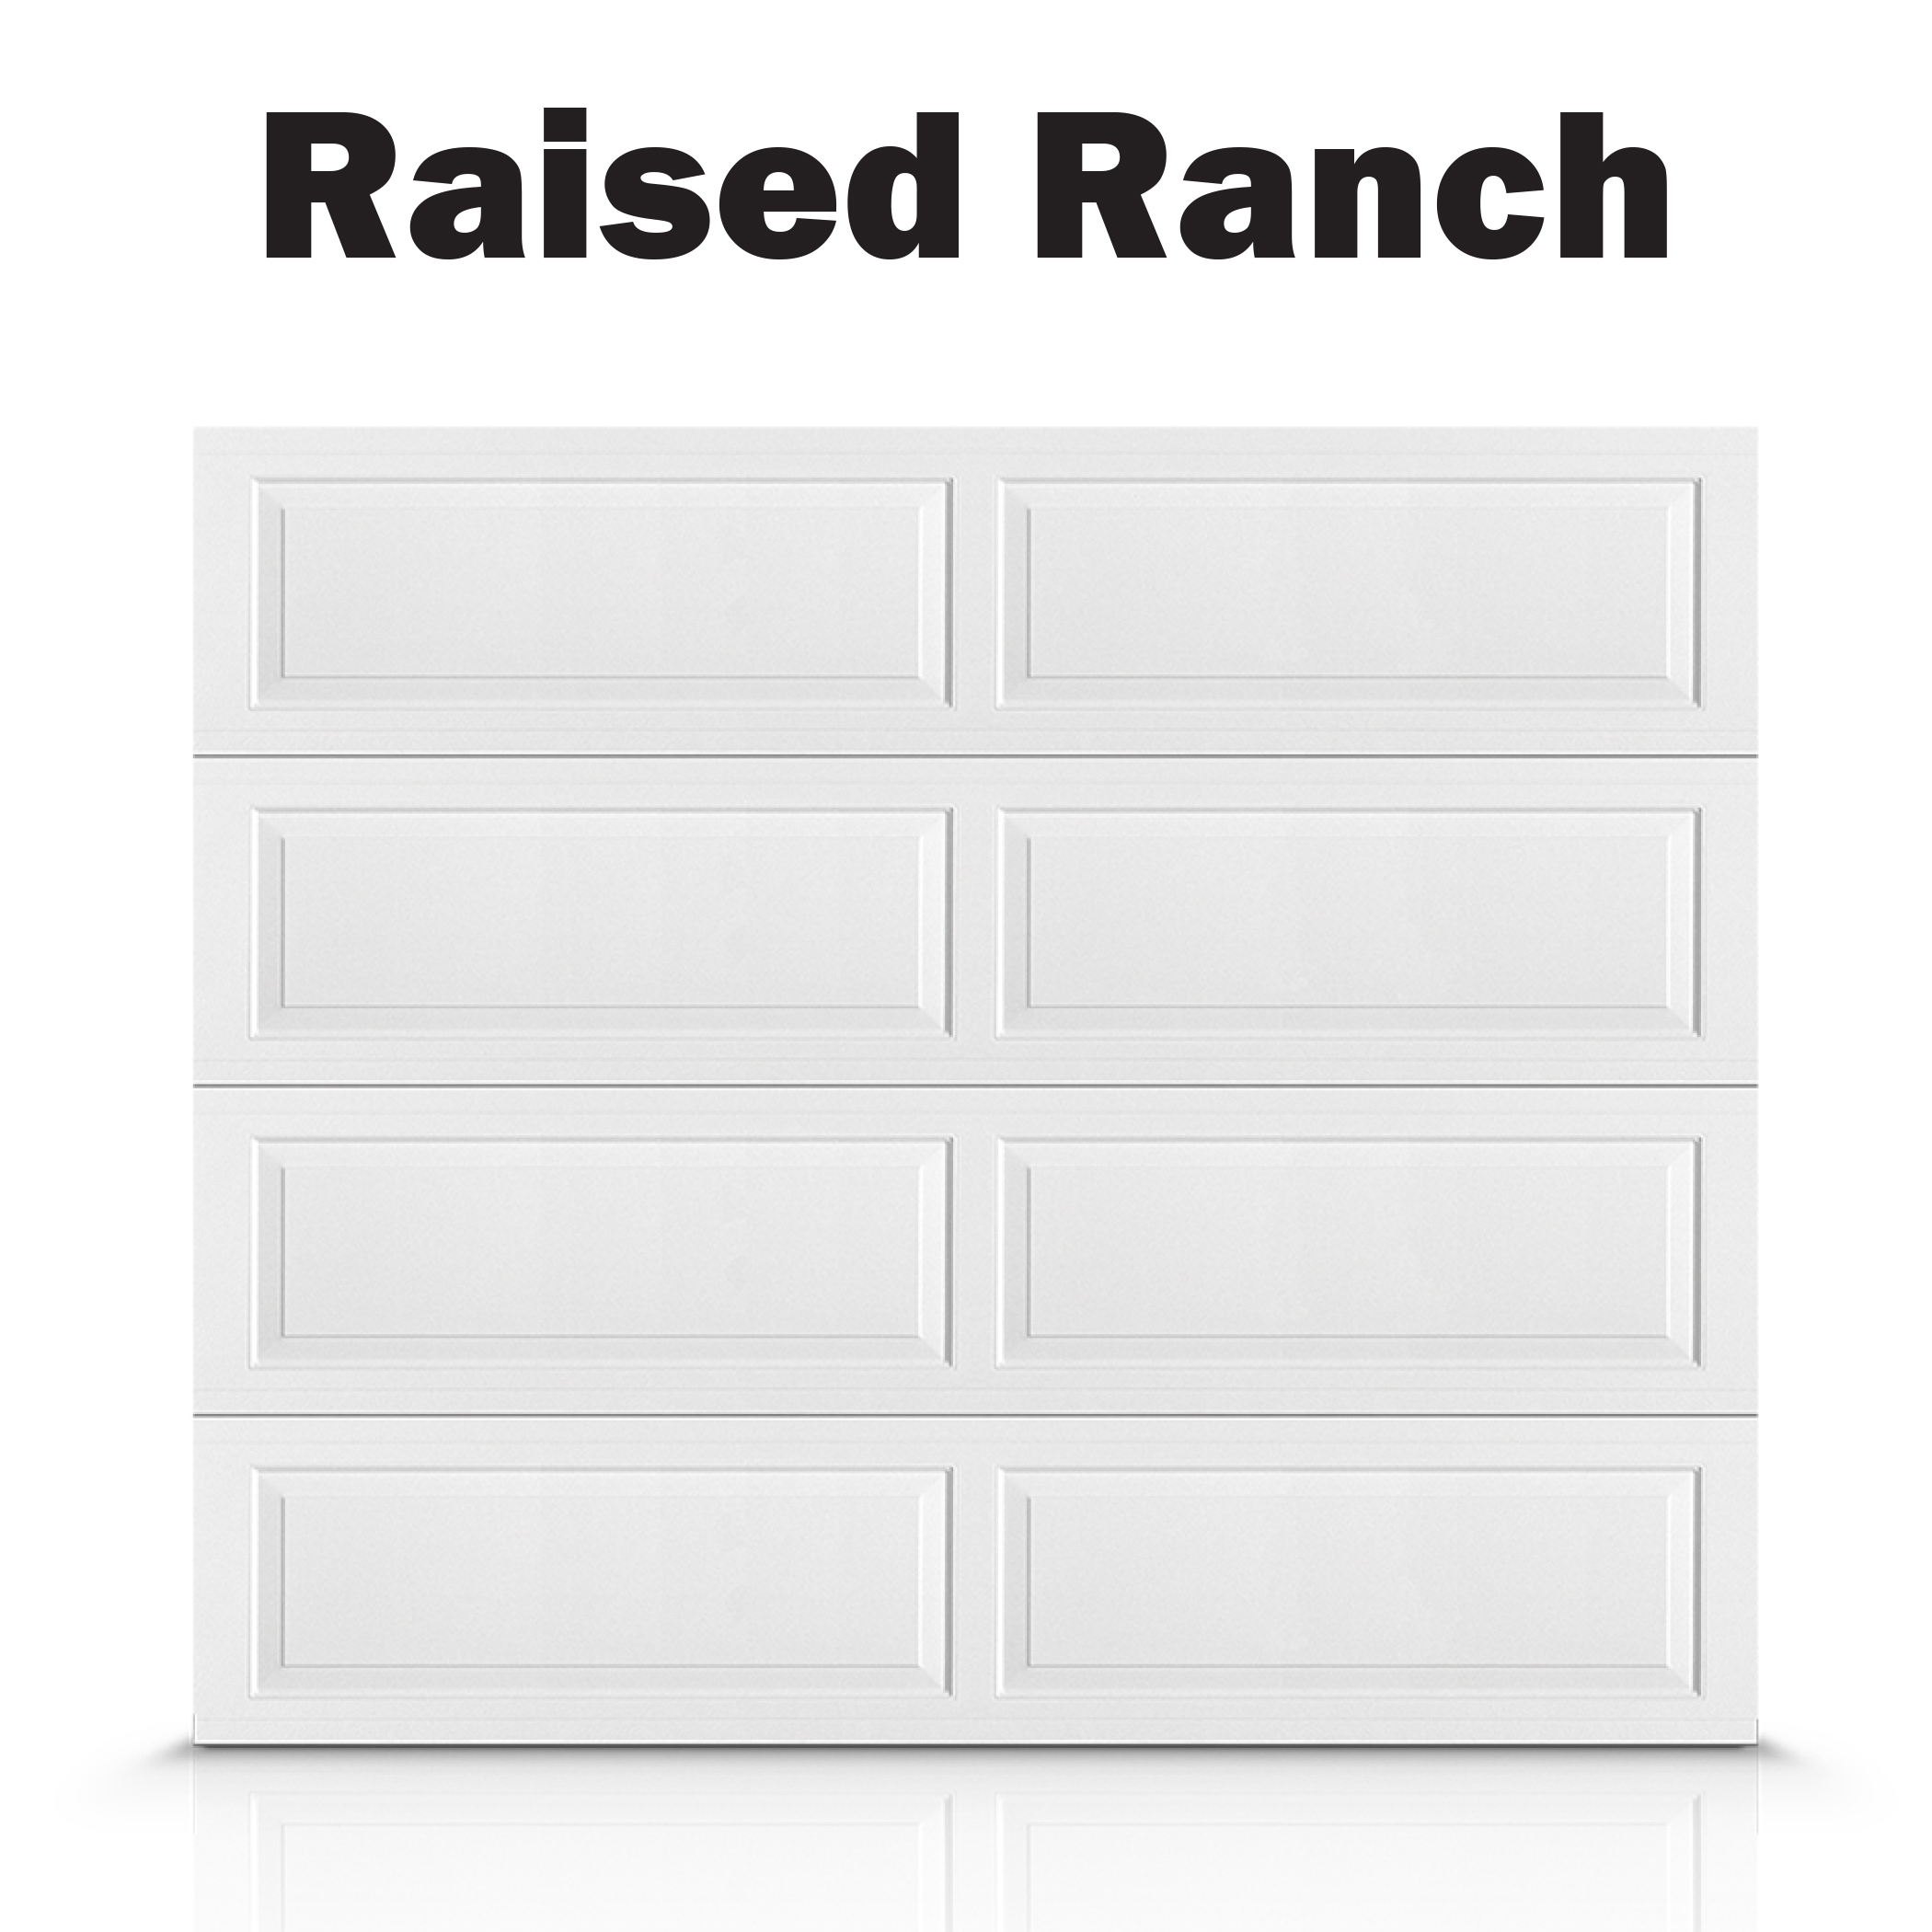 Raised Ranch - Premium.jpg